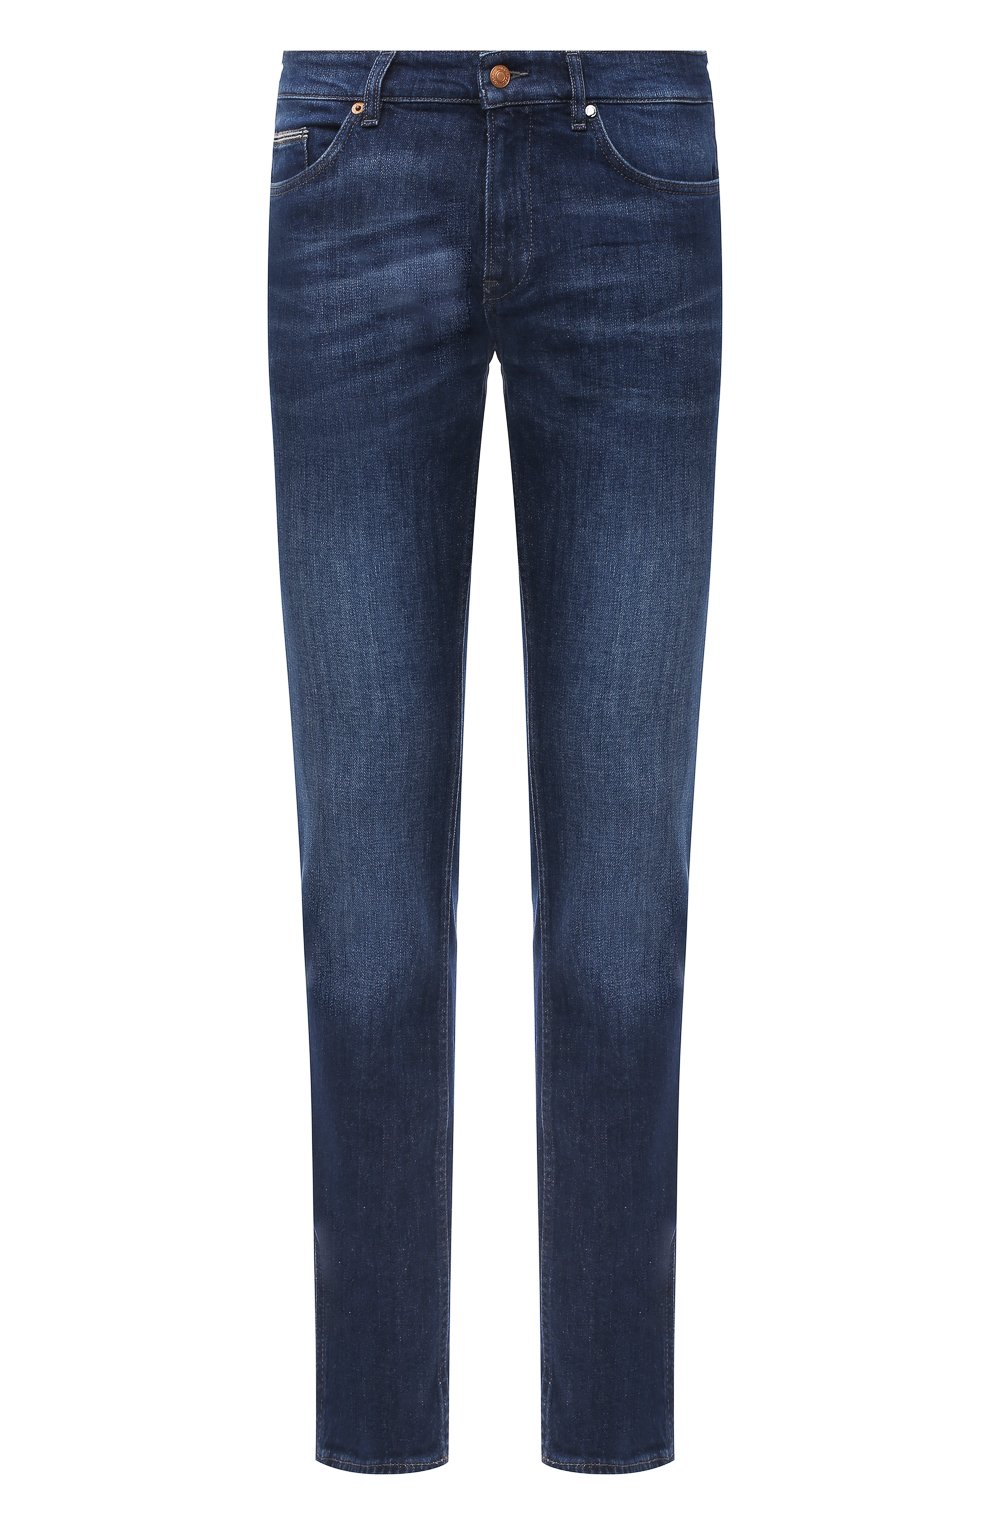 Мужские джинсы BOSS темно-синего цвета, арт. 50437912 | Фото 1